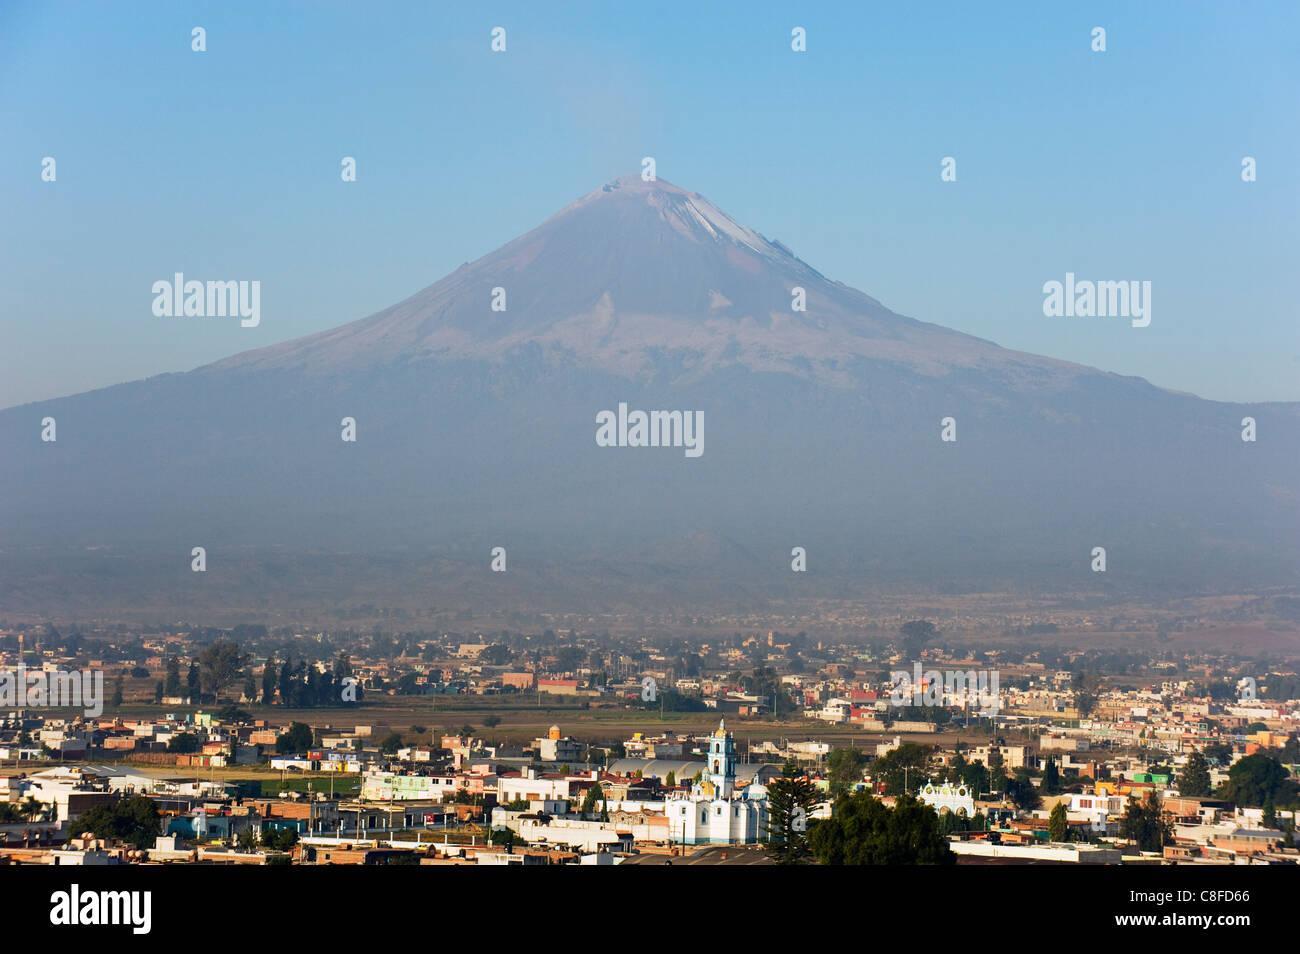 Volcan de Popocatepetl, 5452m, Cholula, Puebla state, Mexico North America - Stock Image